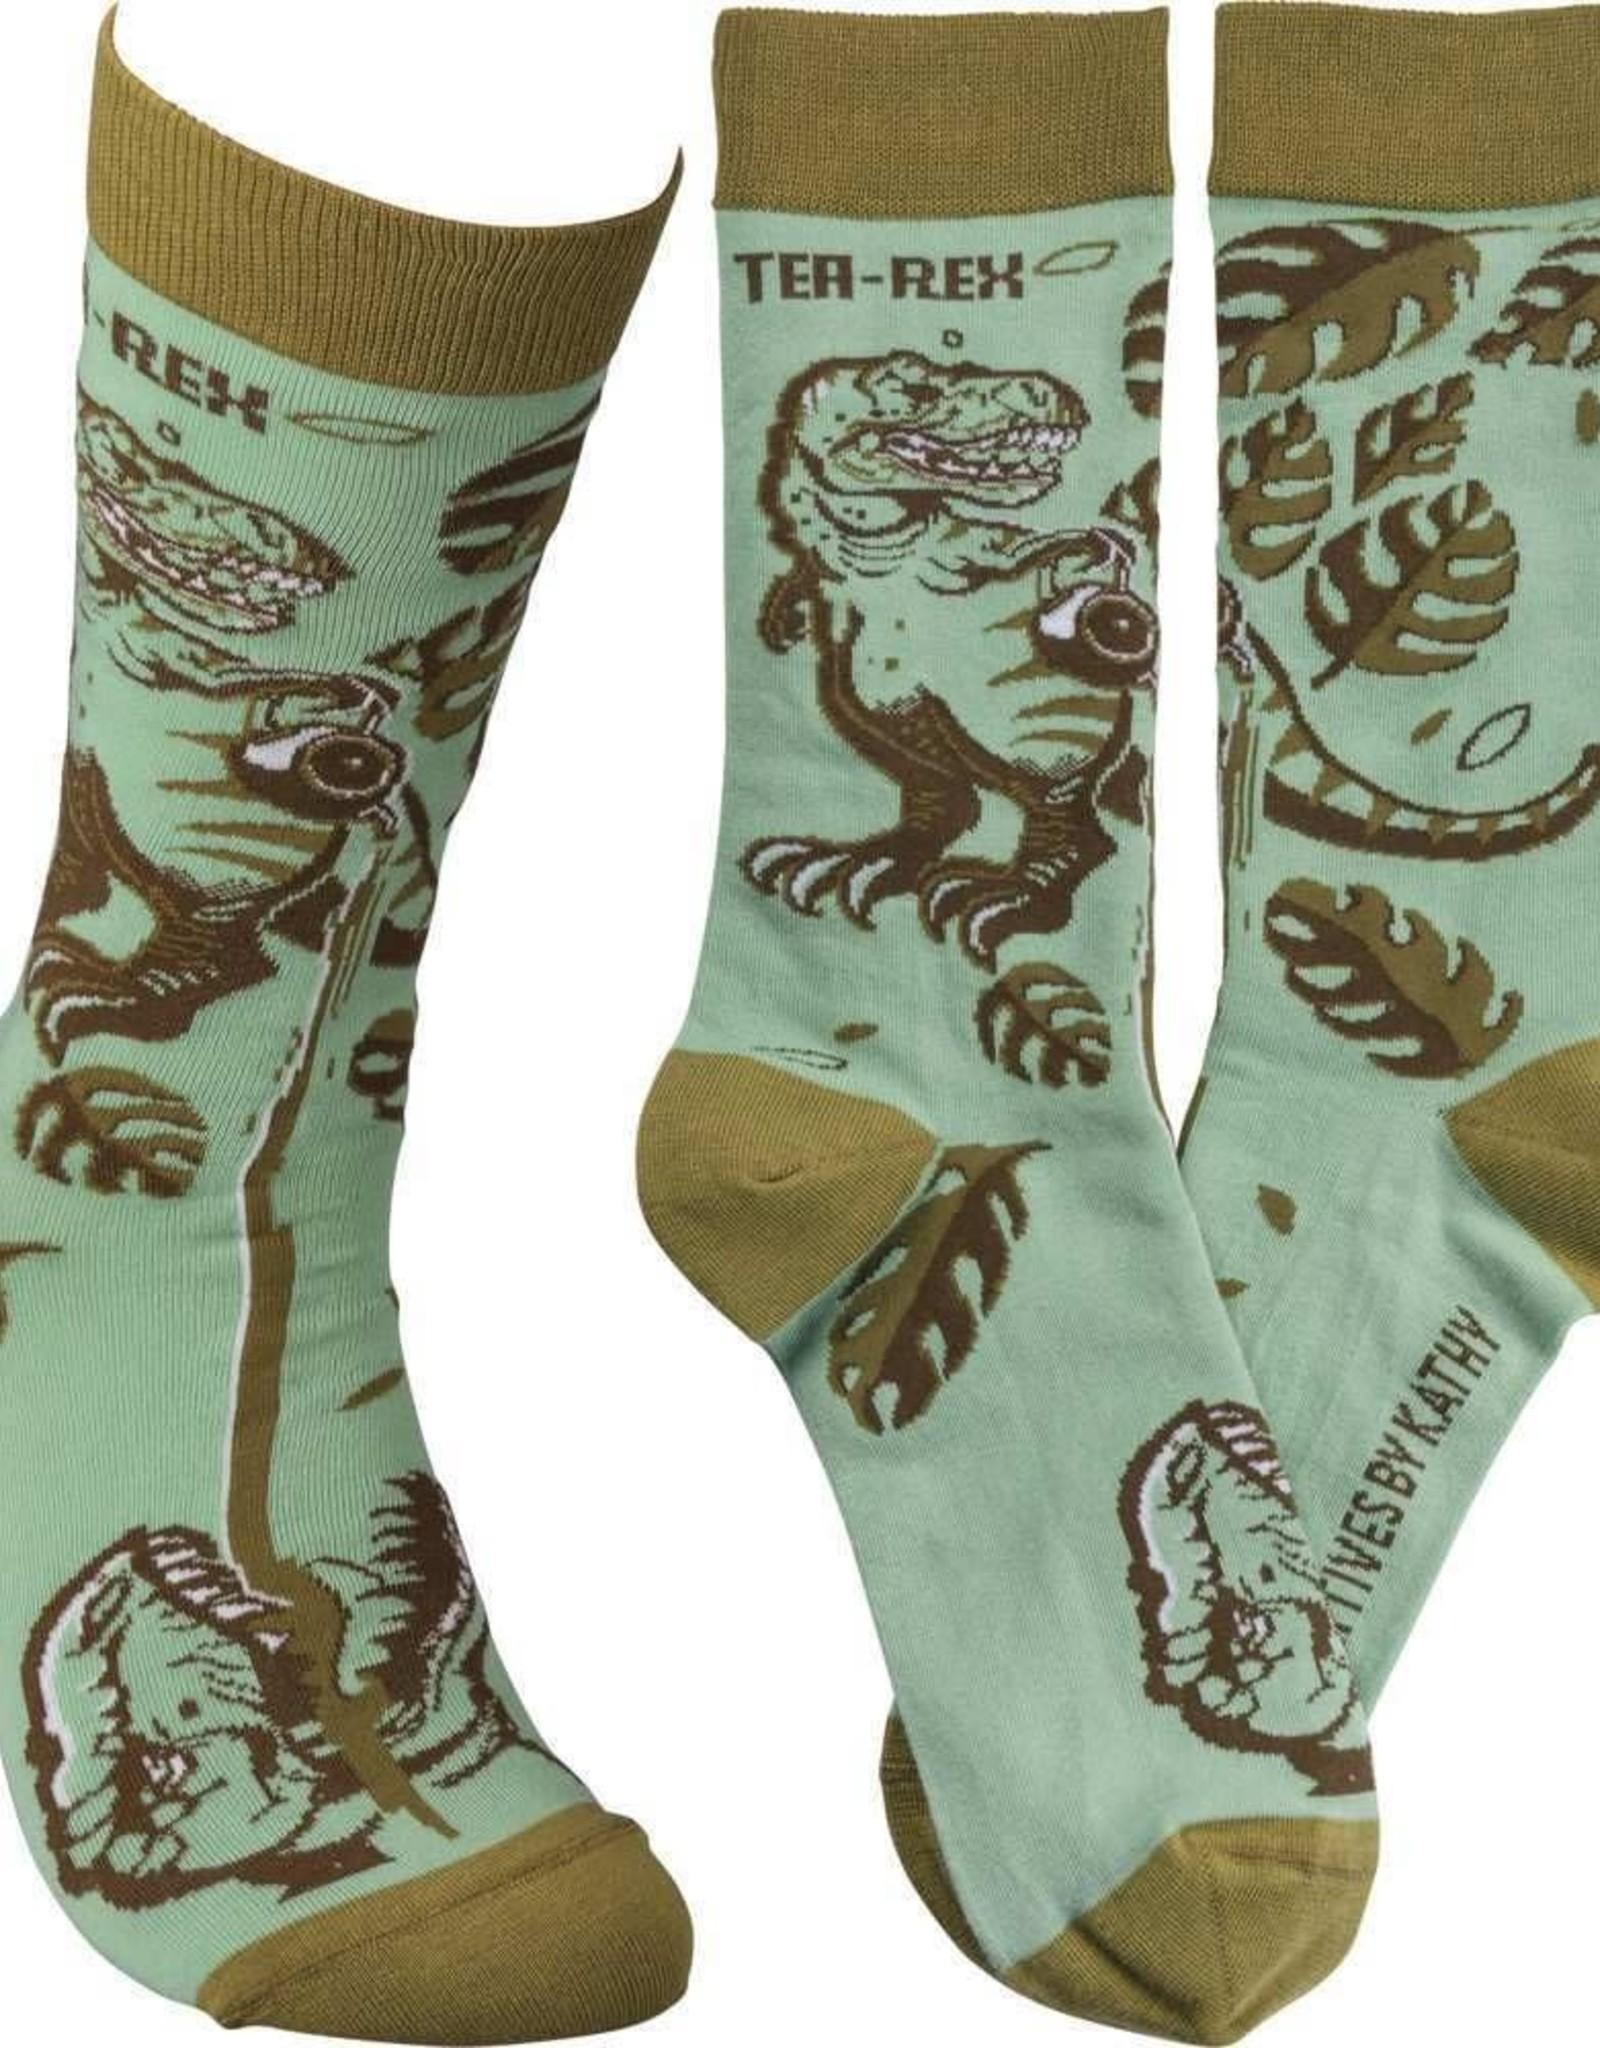 Tea-Rex Socks